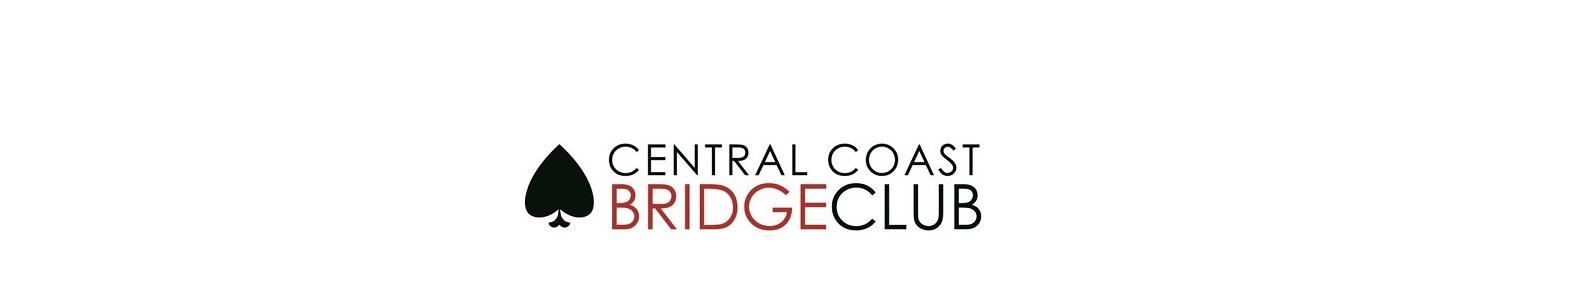 Central Coast Bridge Club Online Swiss Pairs Congress Information Page